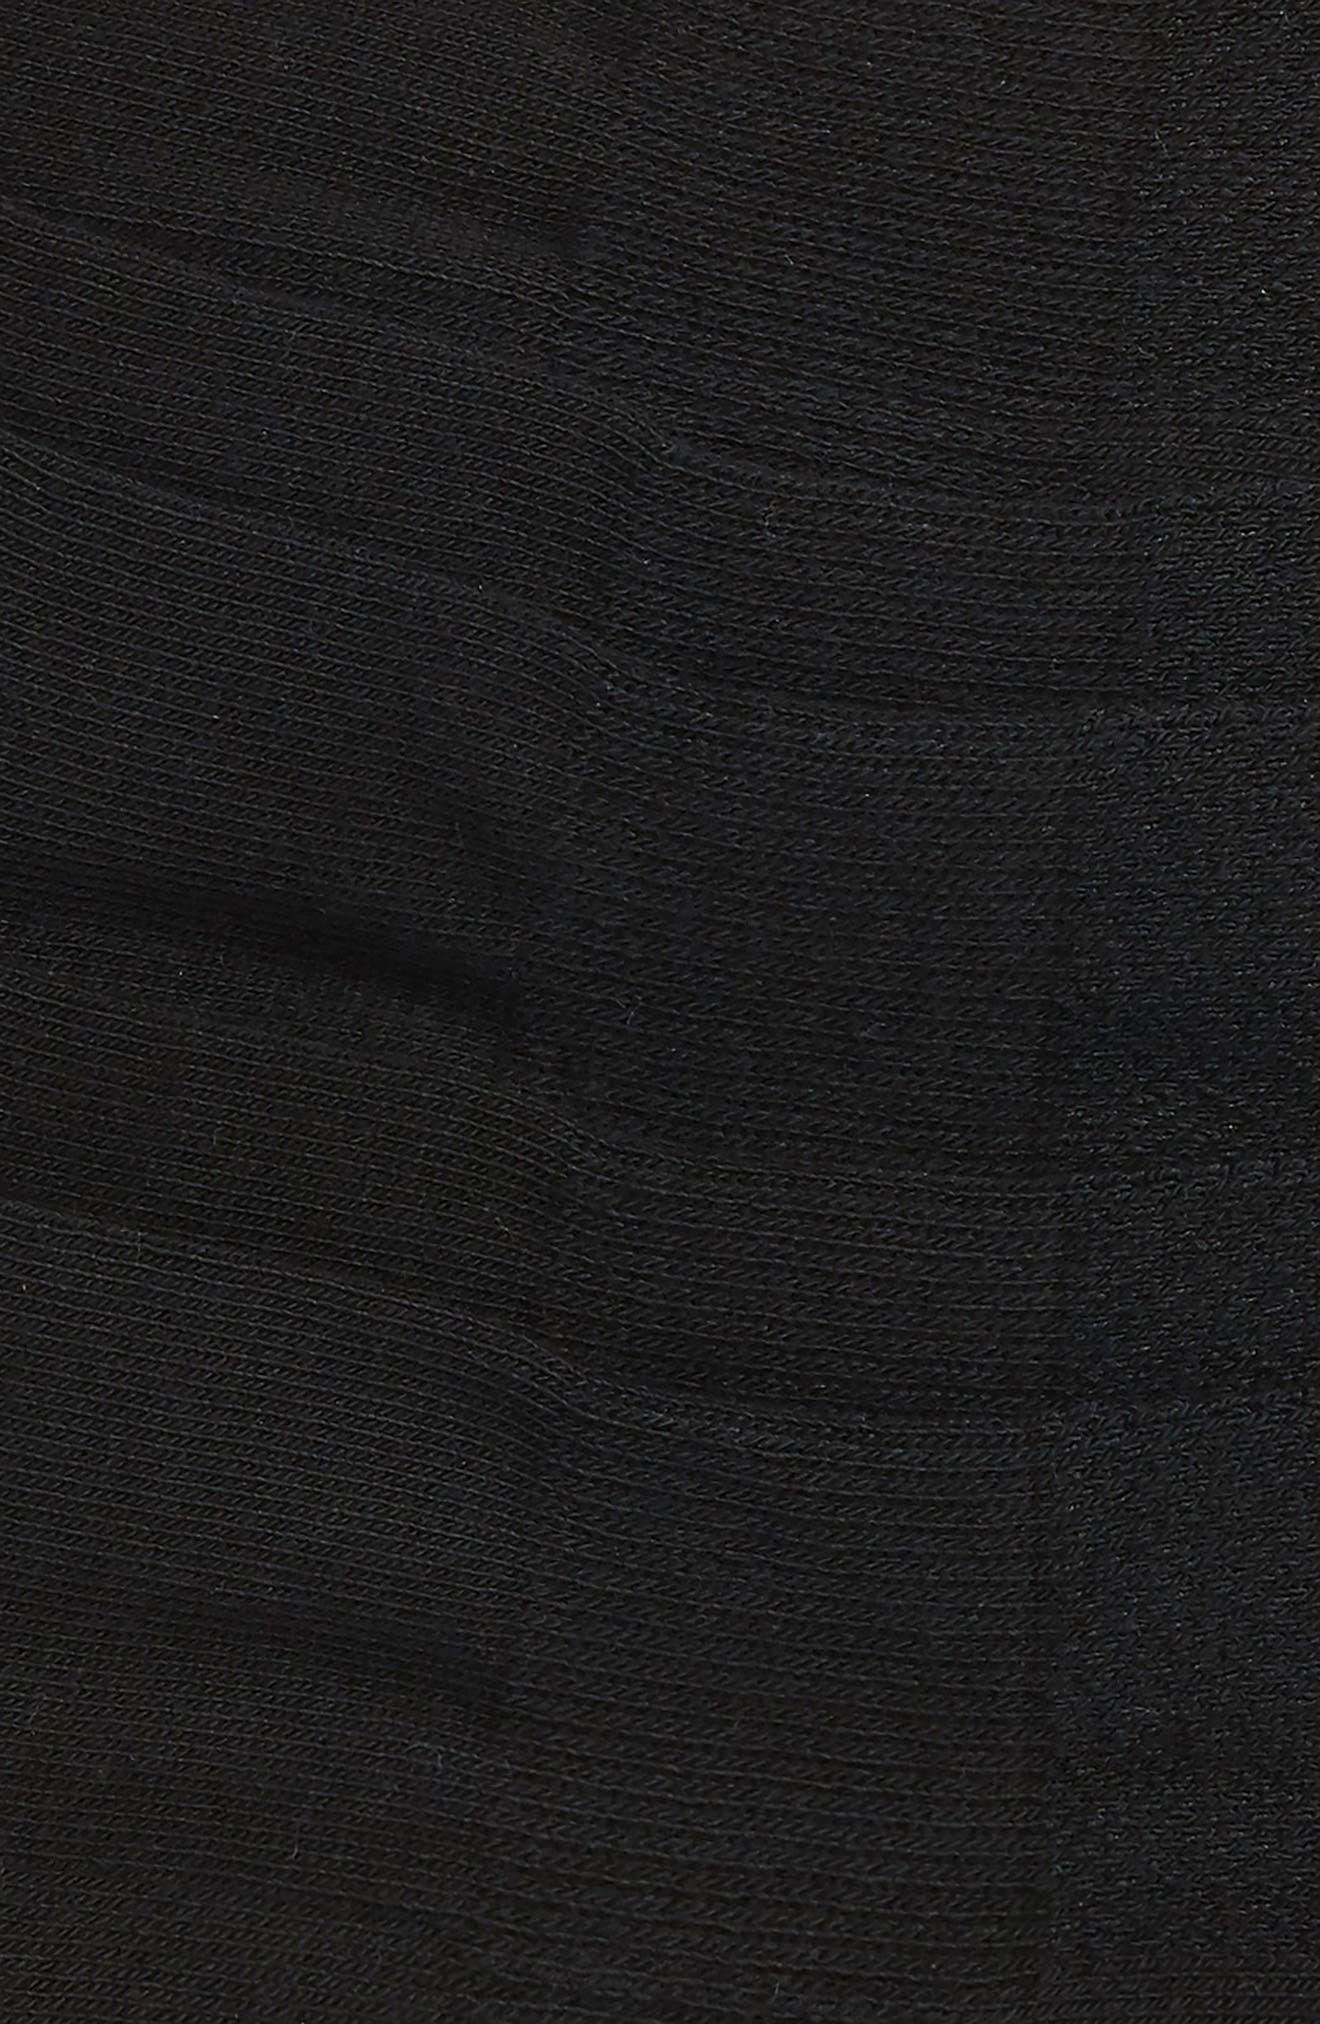 NORDSTROM MEN'S SHOP, 3-Pack No-Show Athletic Socks, Alternate thumbnail 2, color, BLACK